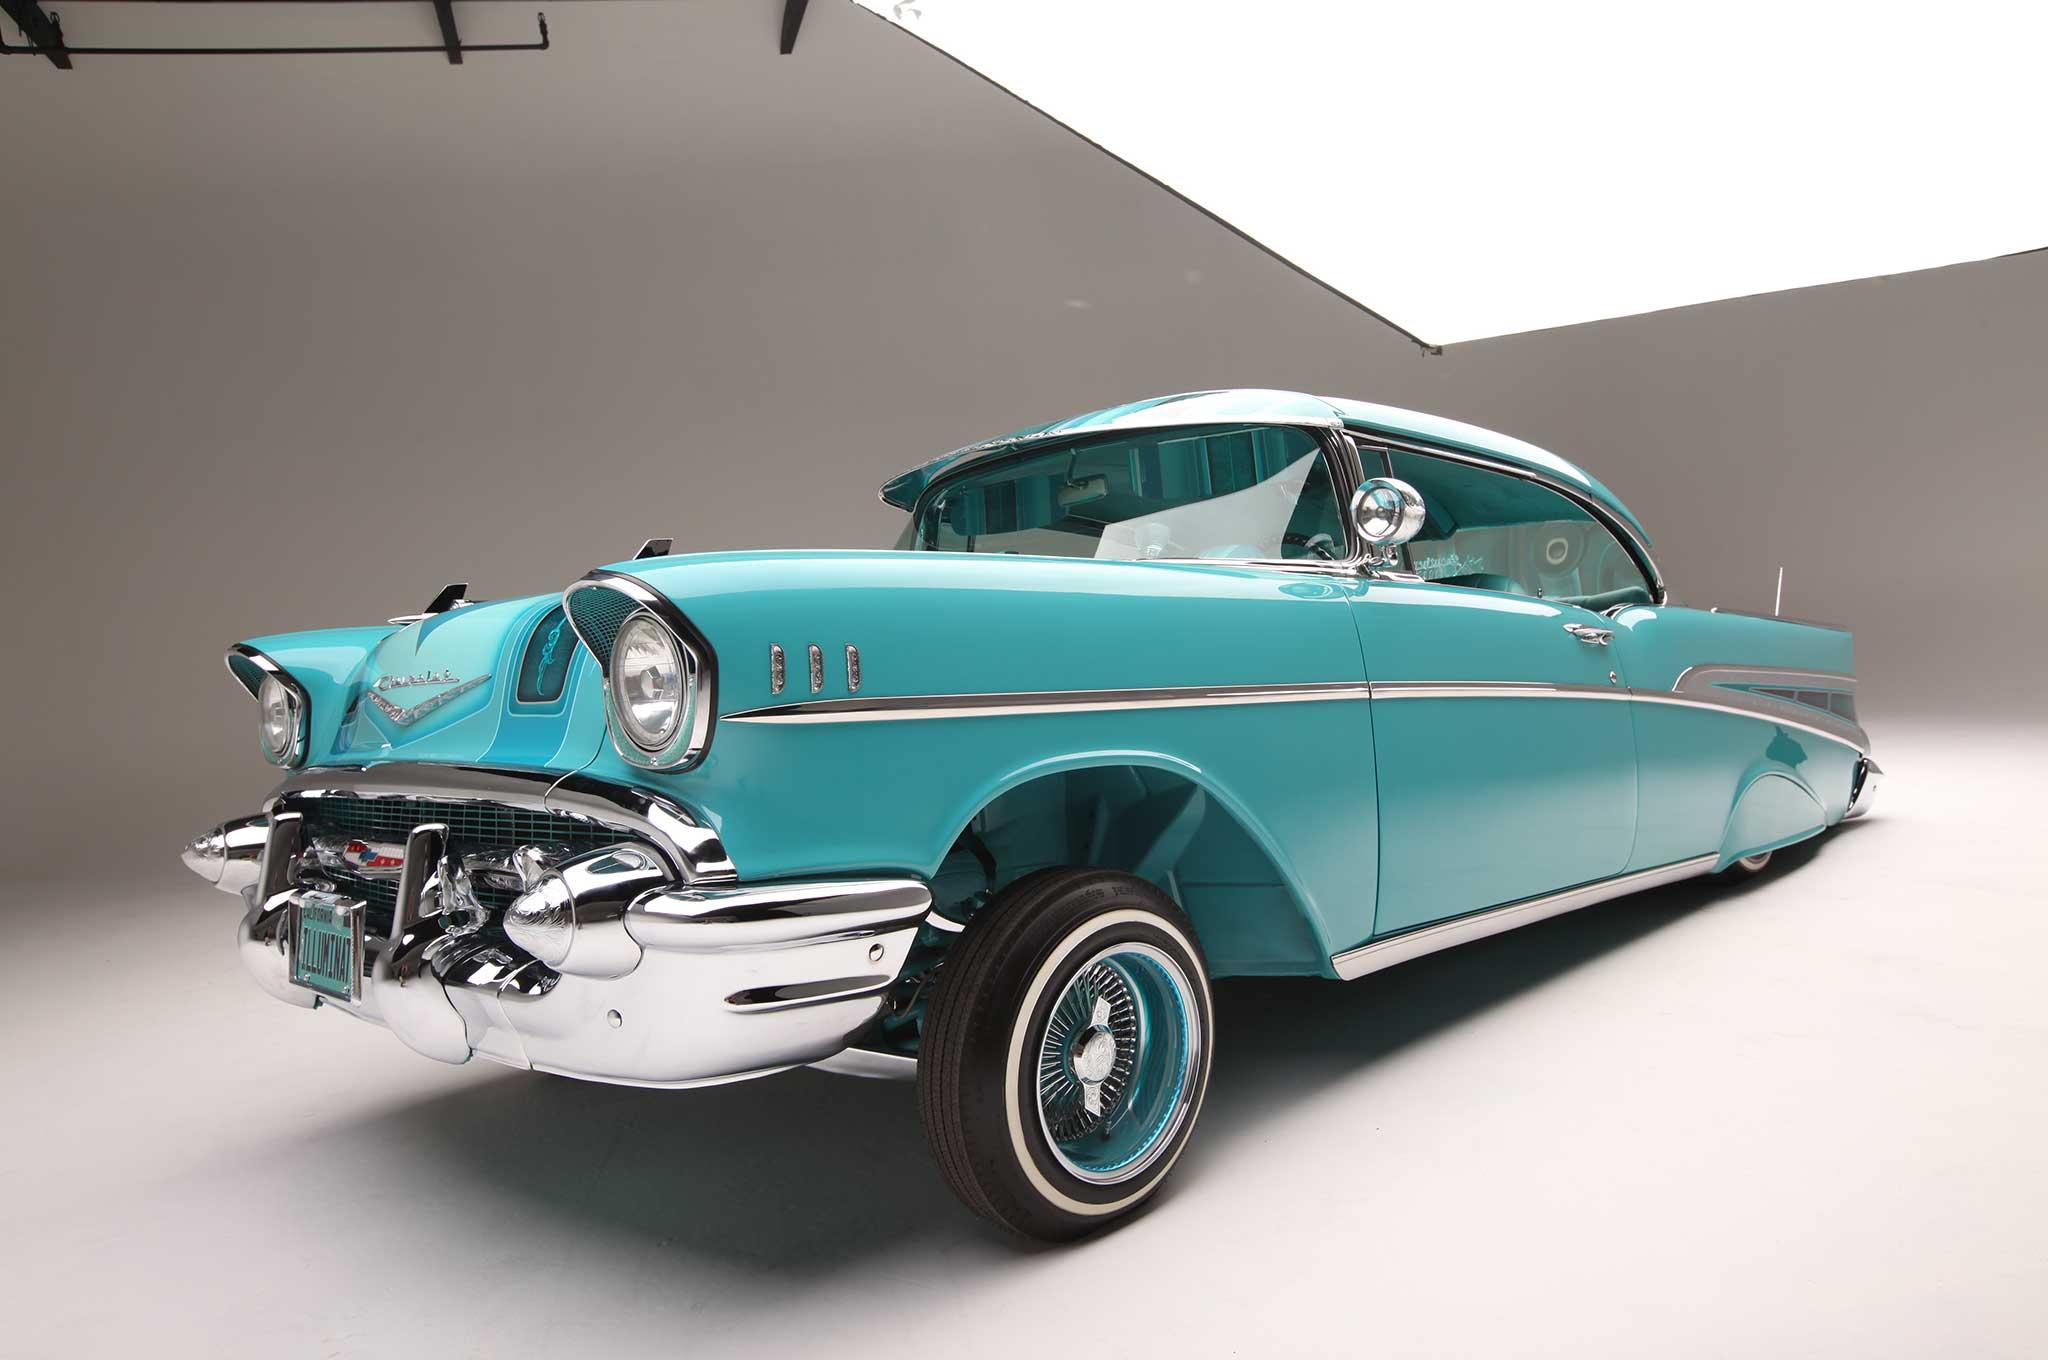 Craigslist Santa Fe >> 1957 Chevrolet Bel Air - Modern-Day Monarch - Lowrider